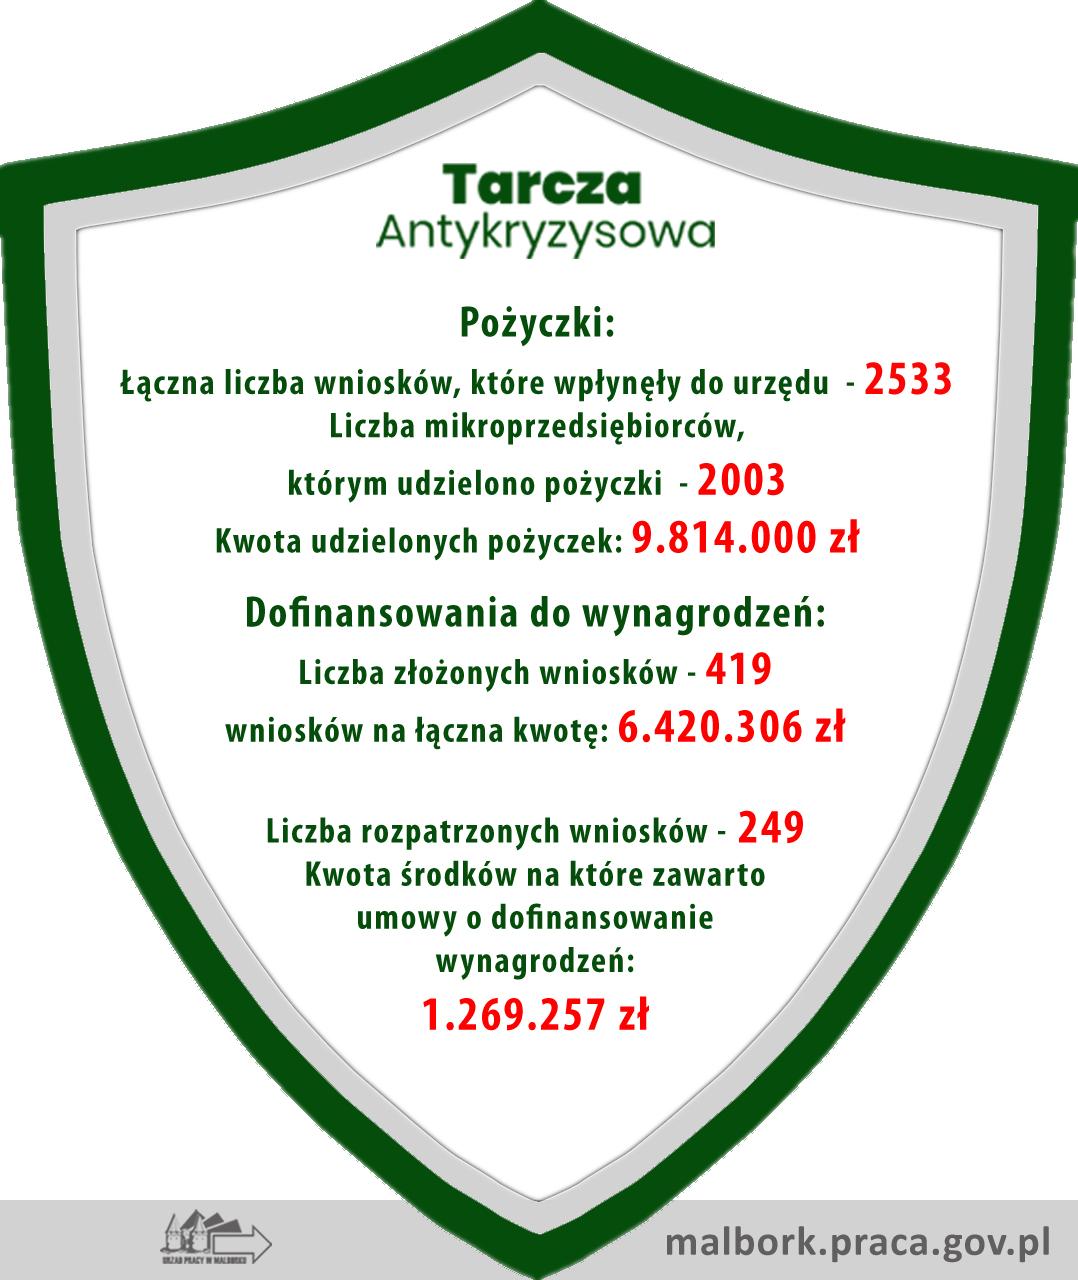 http://m.82-200.pl/2020/05/orig/tarcza-antykryzysowa-22-05-5947.jpg